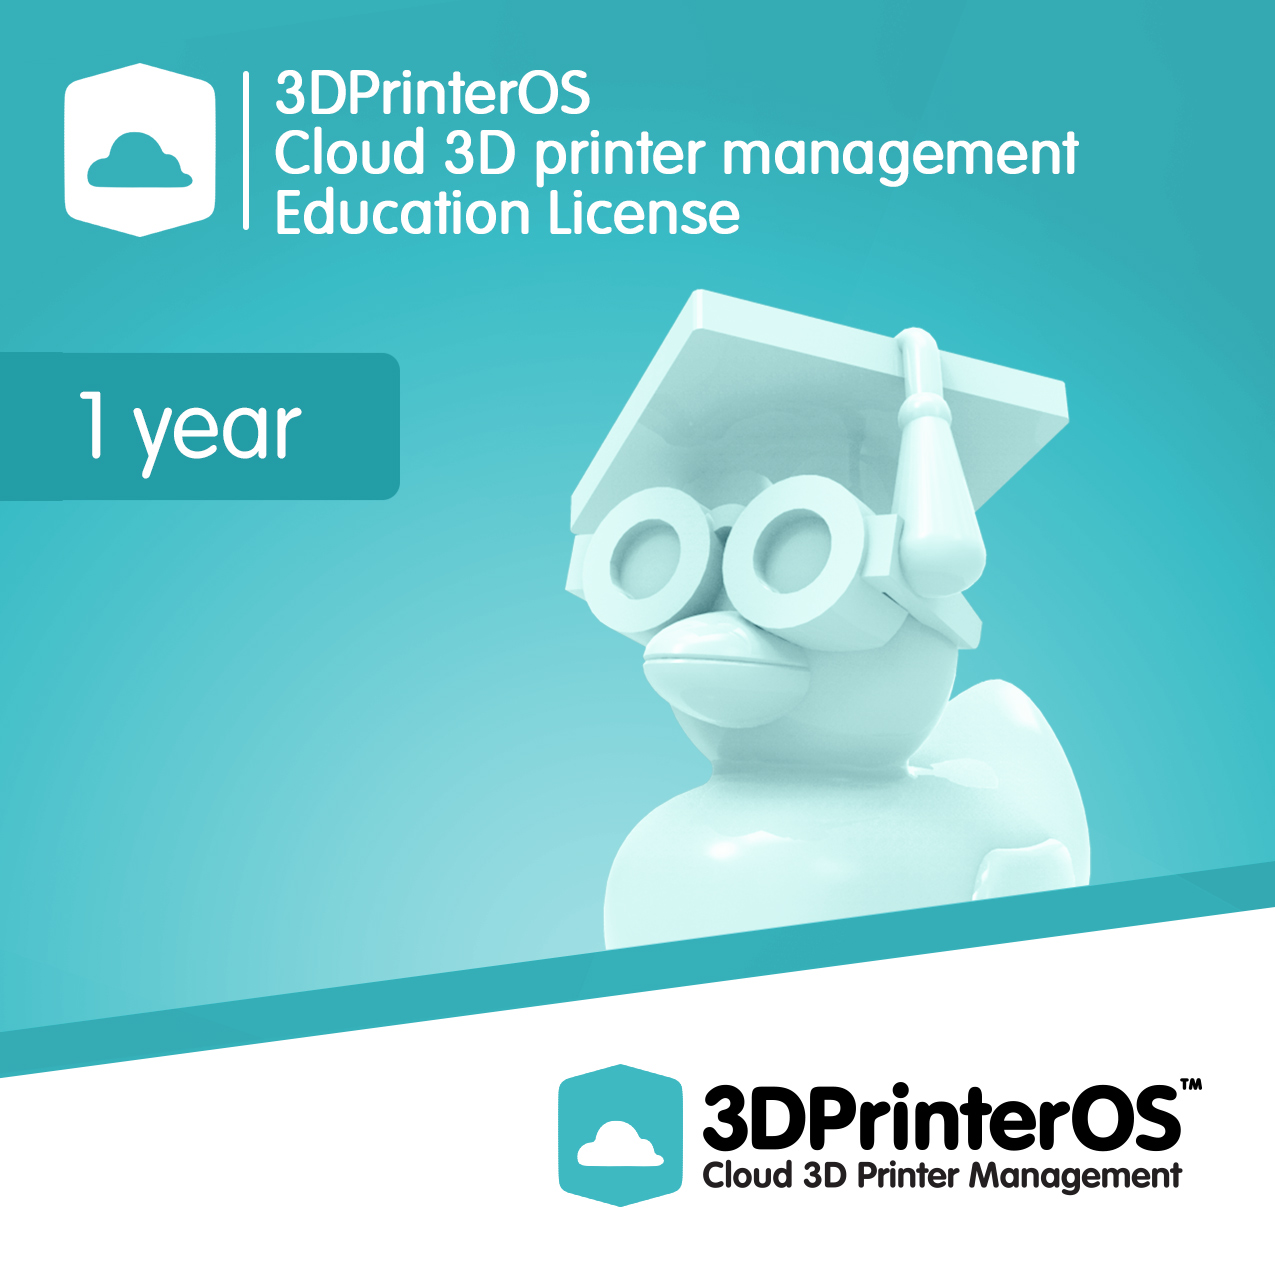 Educational 3D Printing Software - 3DPrinterOS